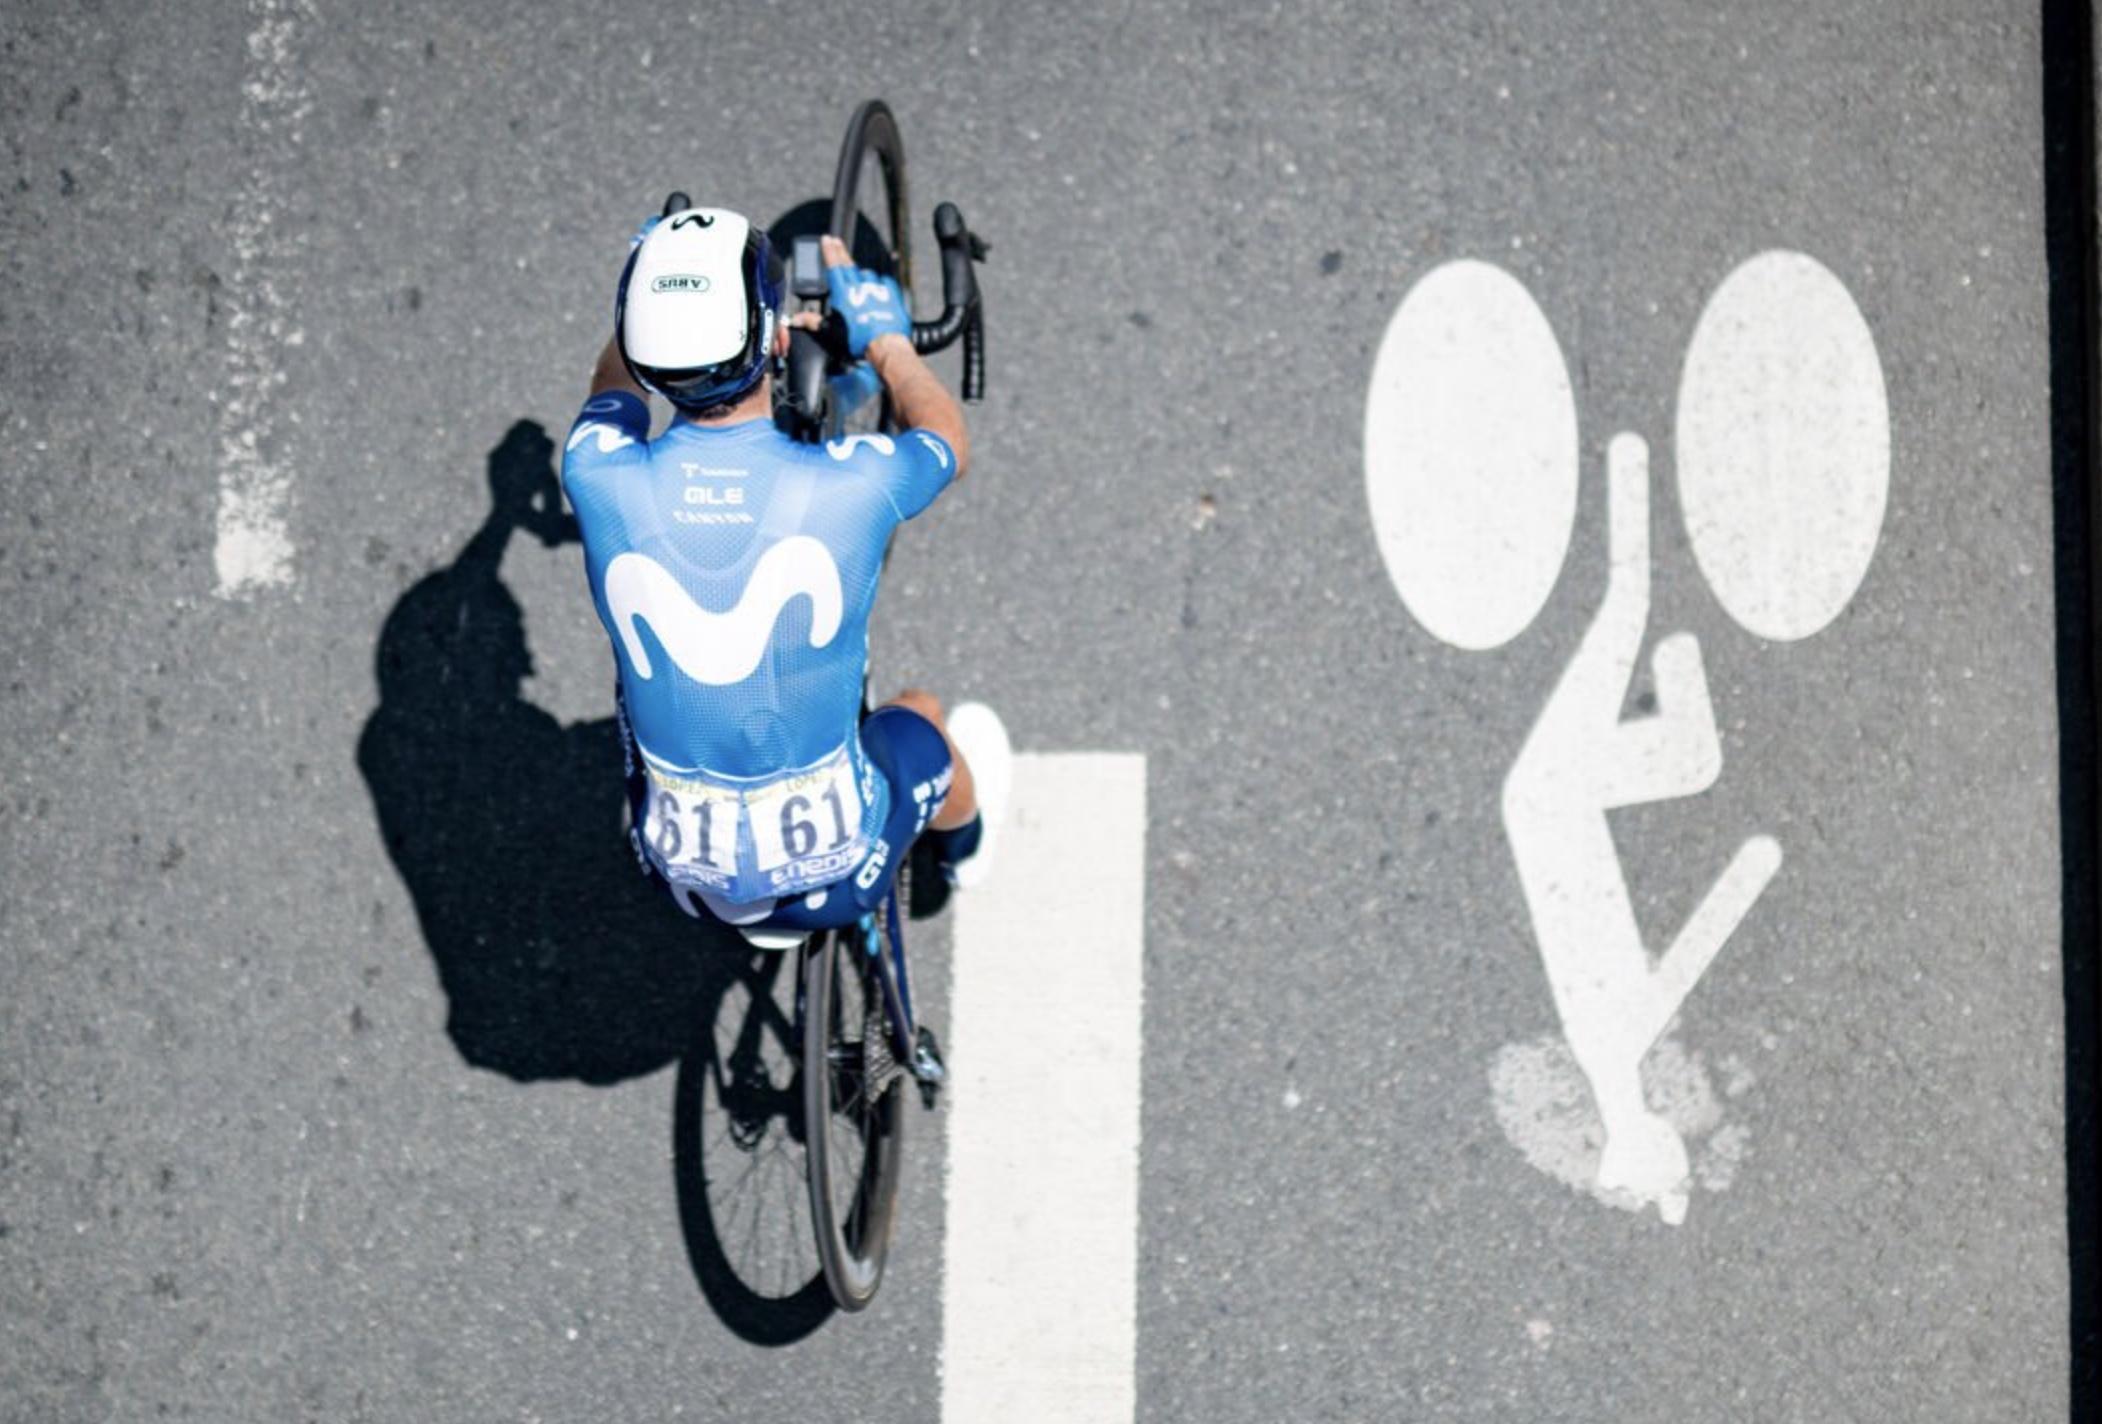 Vinci con Canyon un kit del Team Movistar